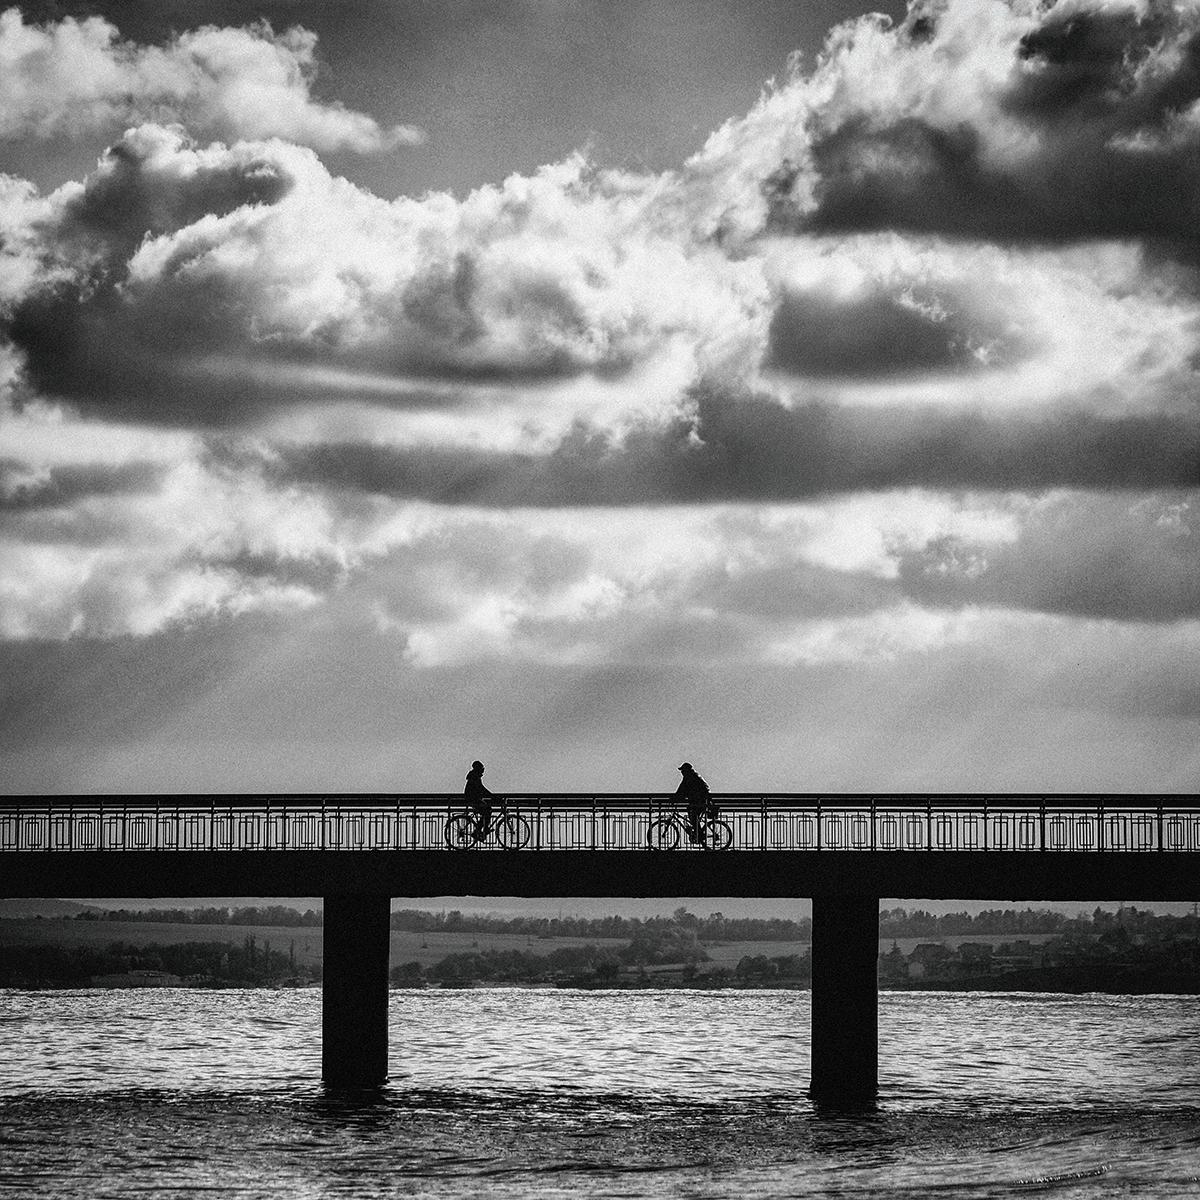 The Point Of No Return | Author ico10 | PHOTO FORUM